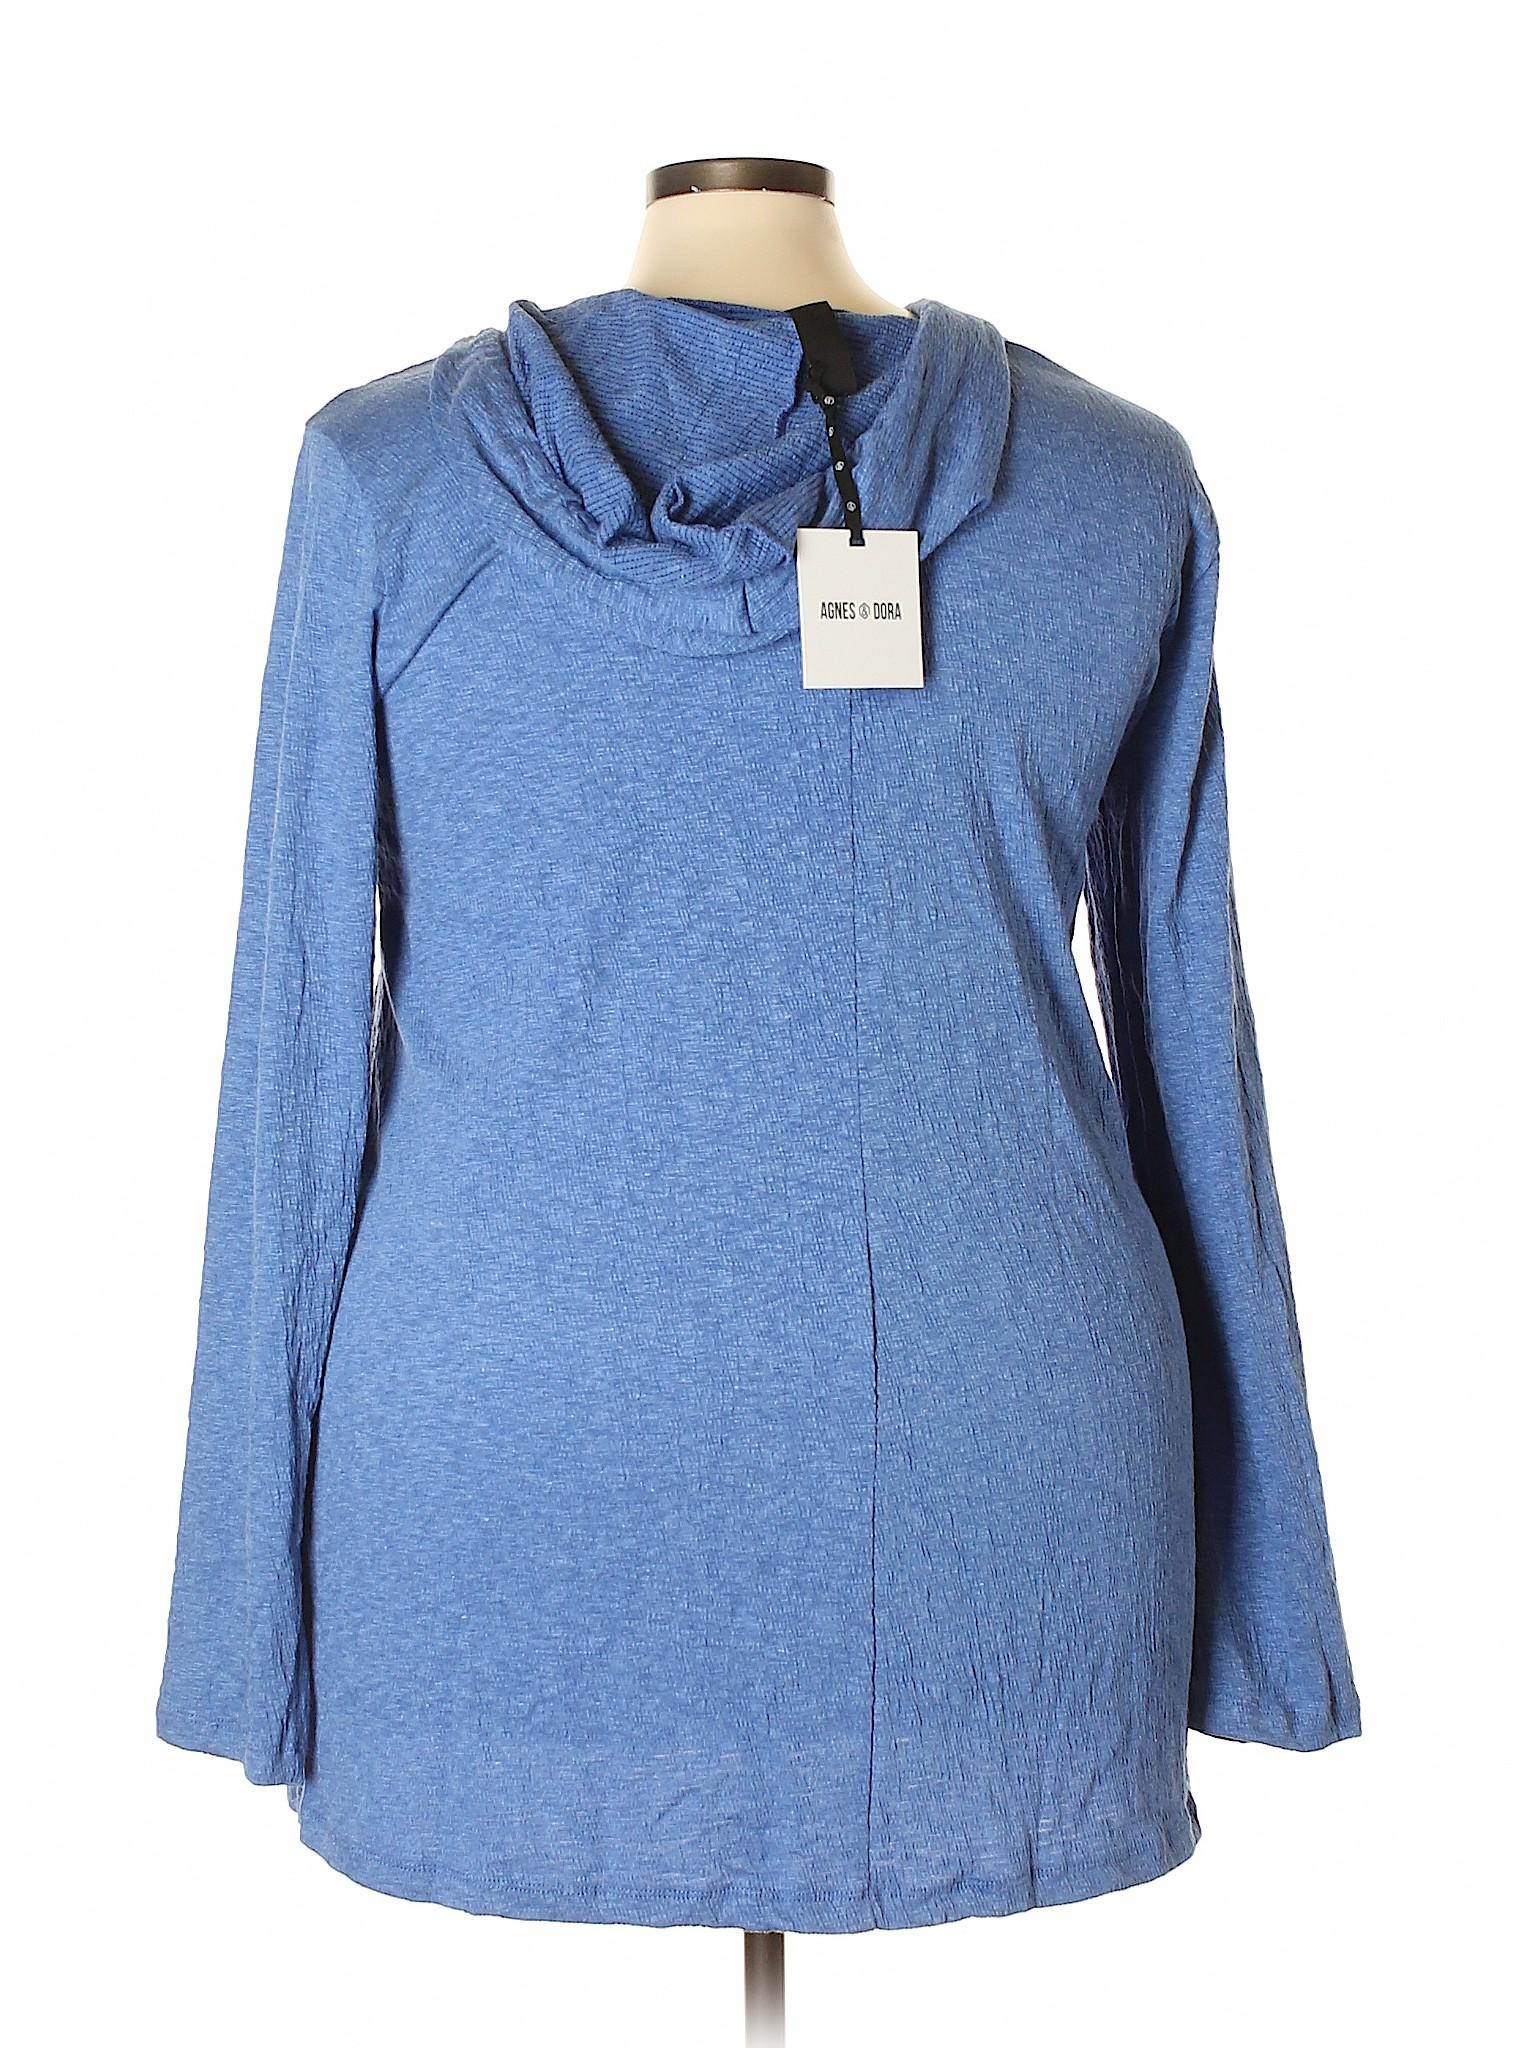 e609d6fa9d0de Agnes And Dora Plus-Sized Clothing On Sale Up To 90% Off Retail | thredUP